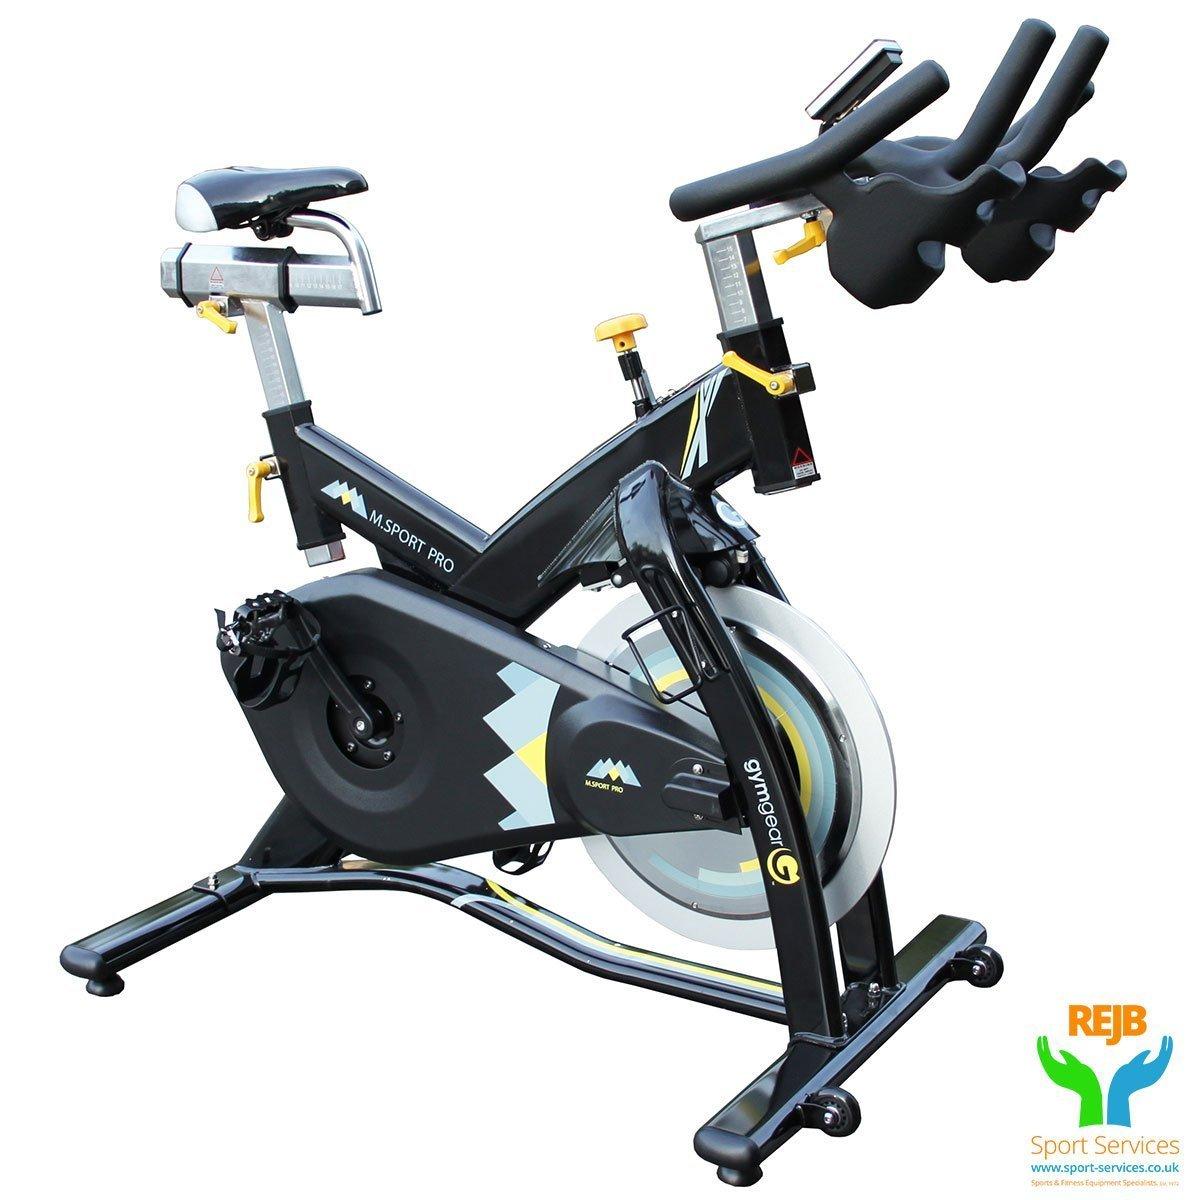 Gym Gear M Sport Pro Indoor Spin Bike Rejb Sports Services